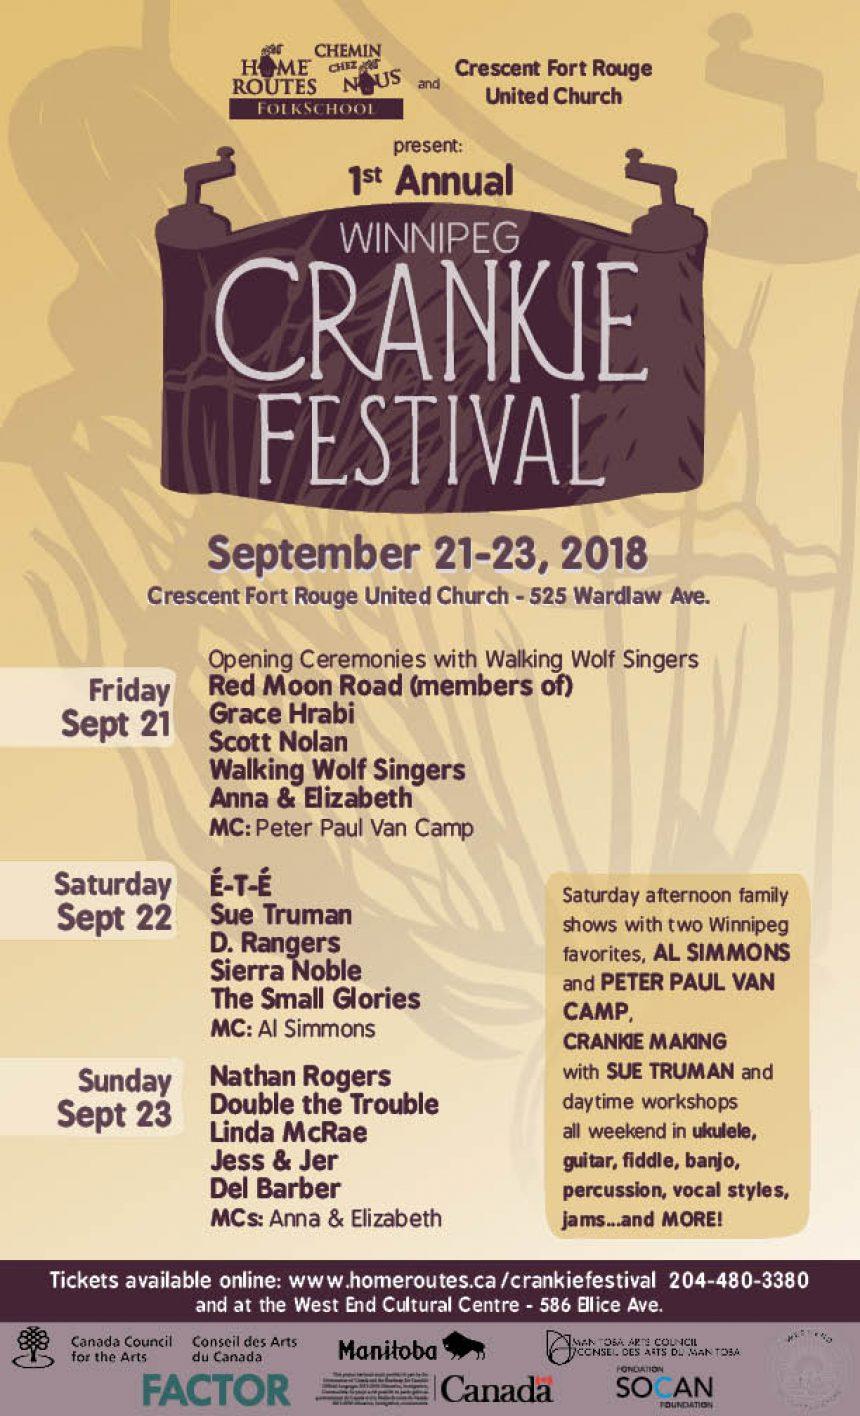 First Annual Winipeg Crankie Festival